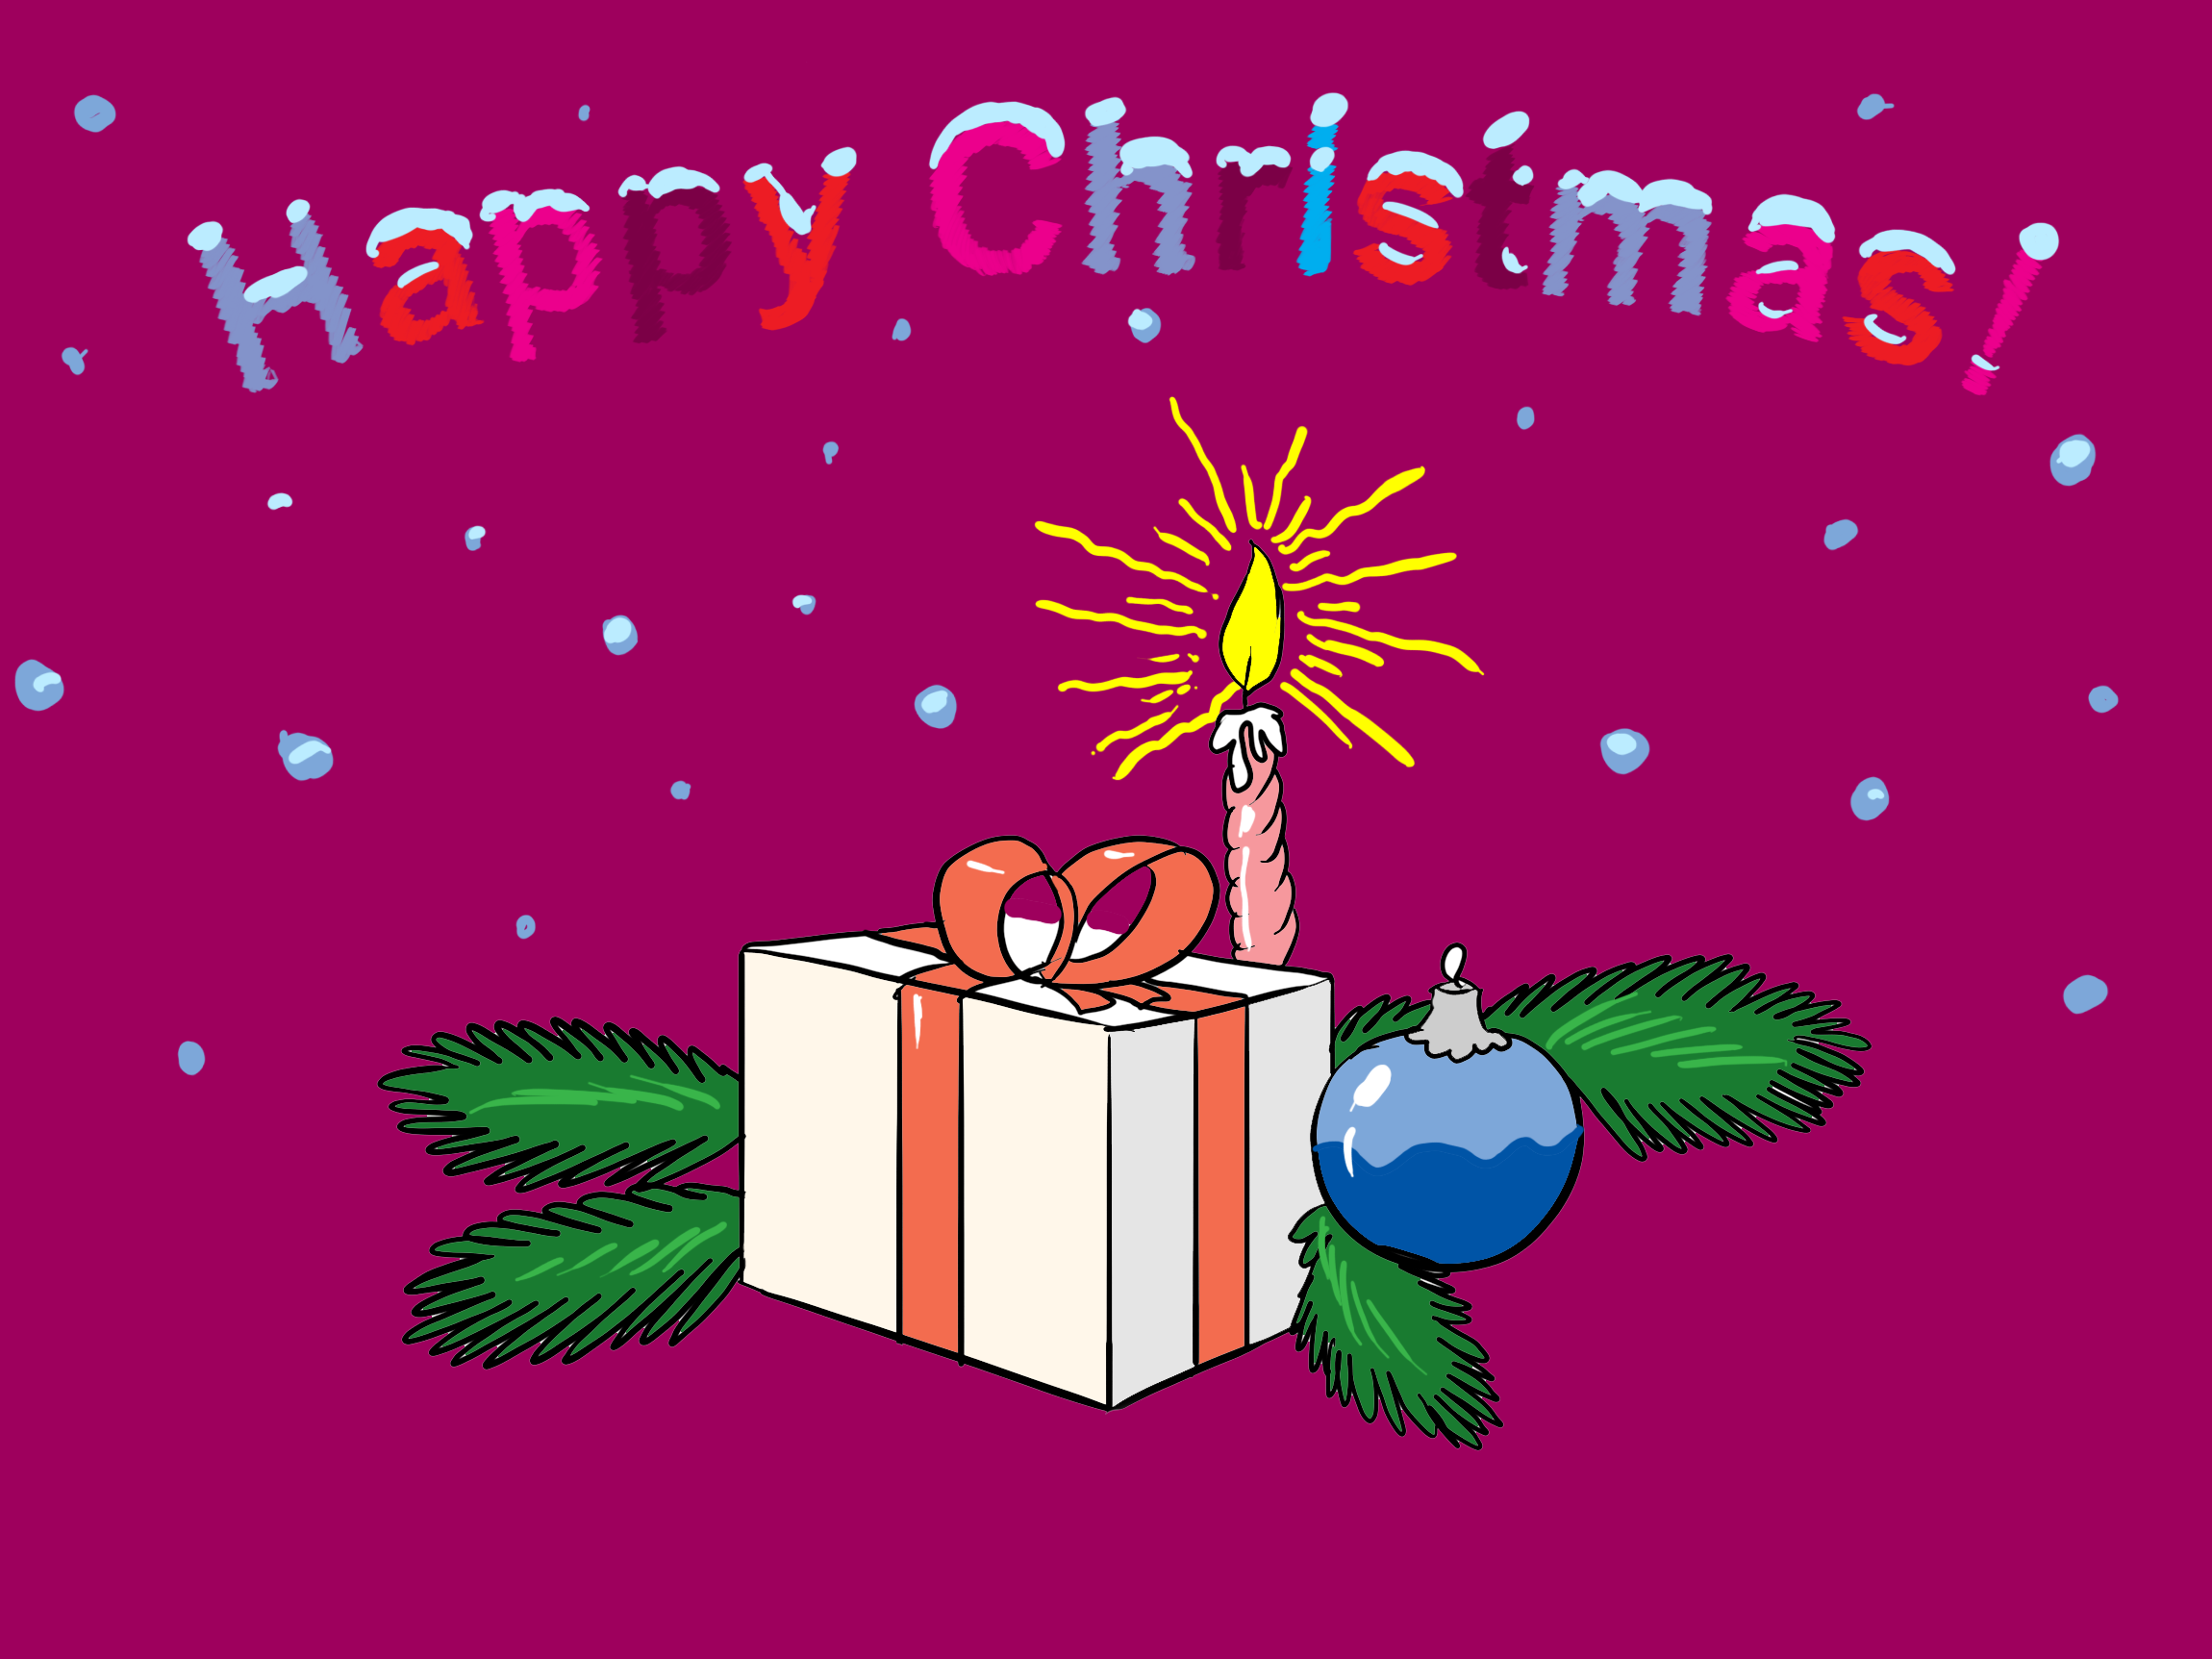 Illustration cadeau – Noël dessins gratuits